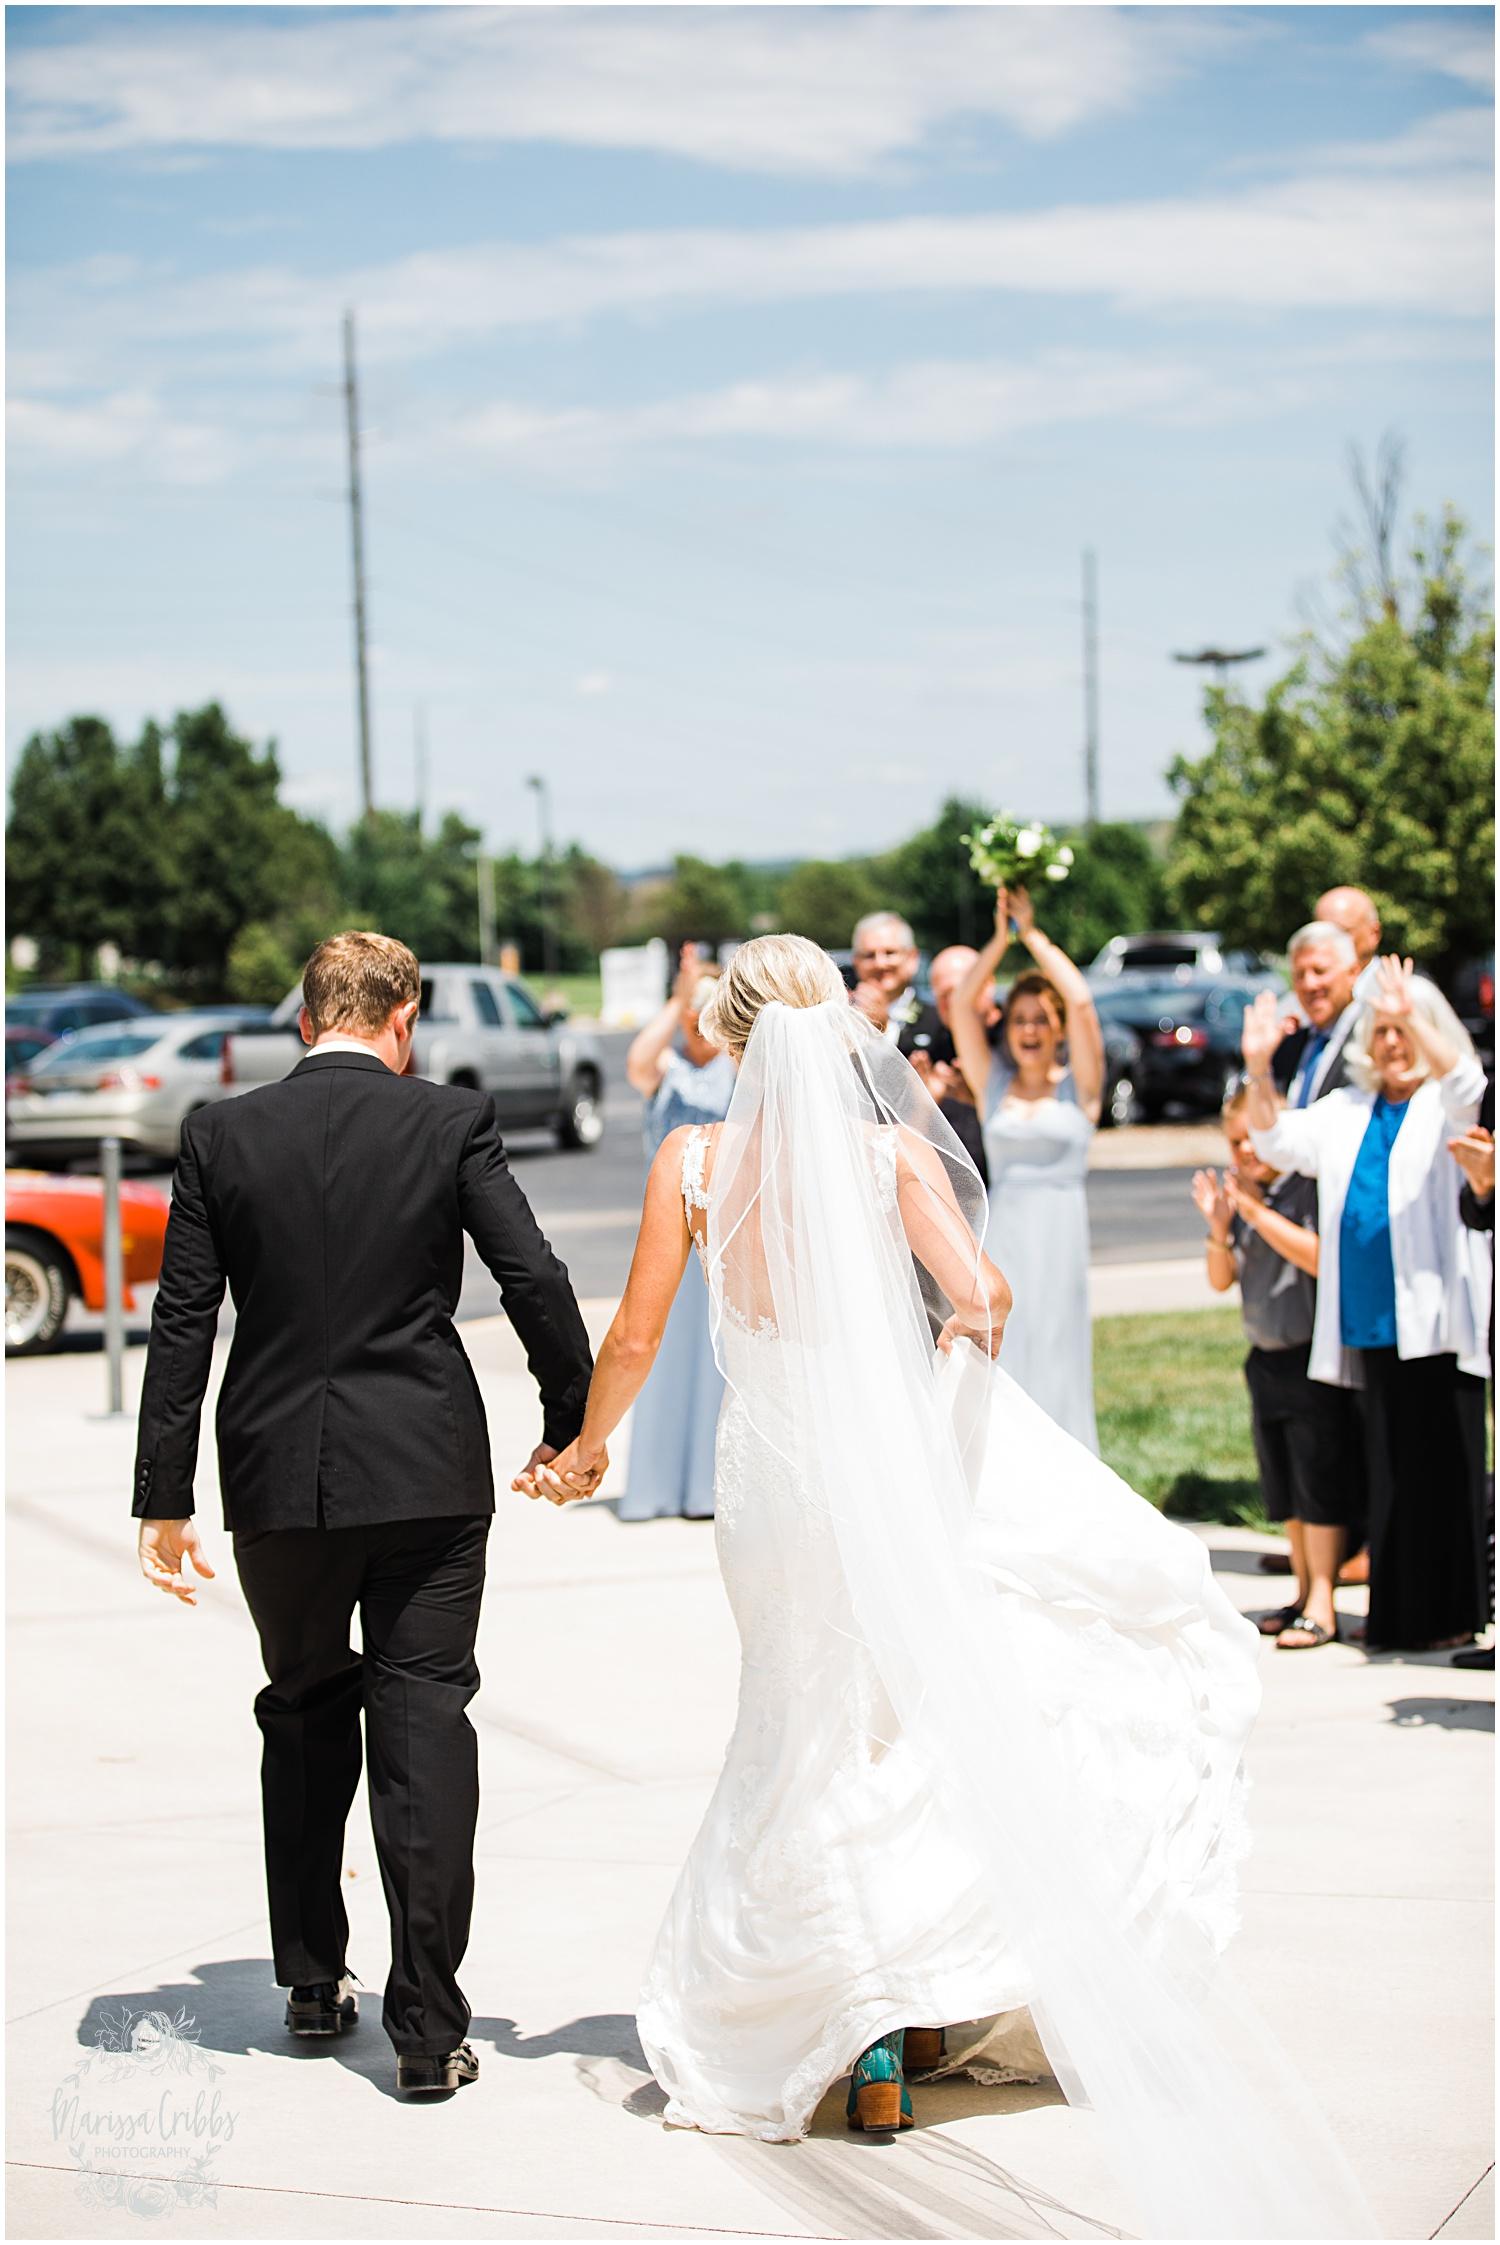 CHELSEA & BEN MARRIED BLOG  | MARISSA CRIBBS PHOTOGRAPHY_8533.jpg